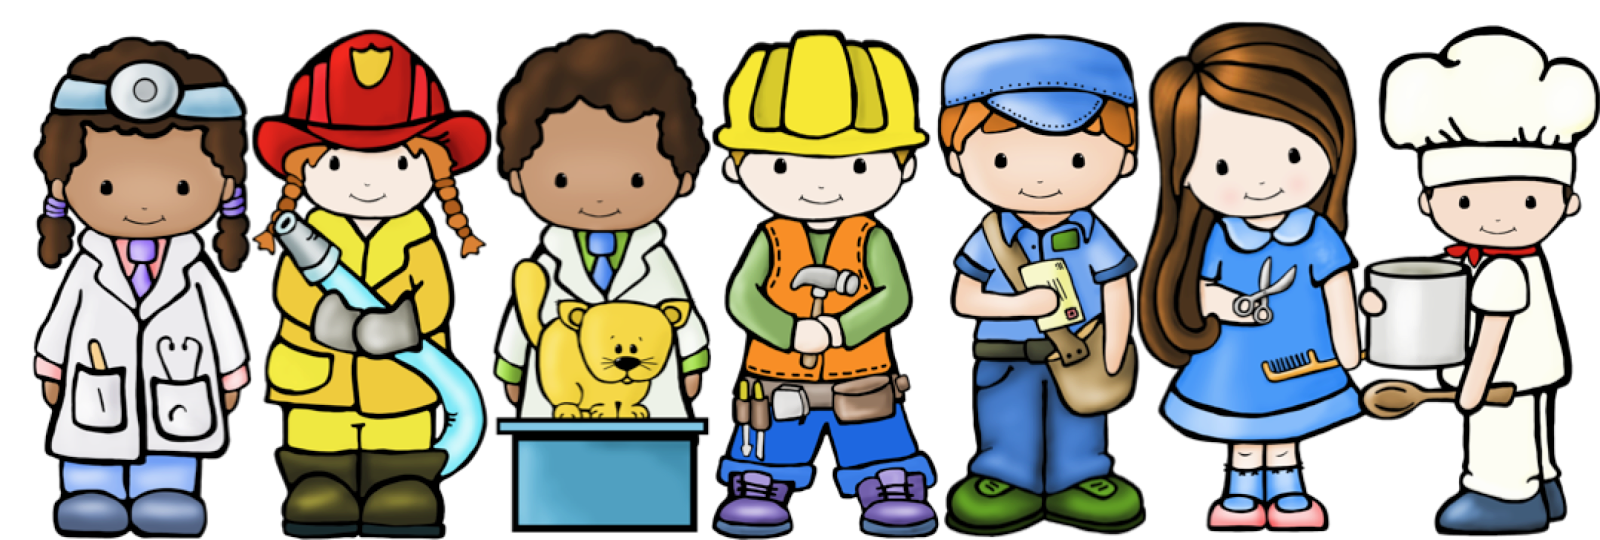 Community Helpers Clipart & Community Helpers Clip Art Images.